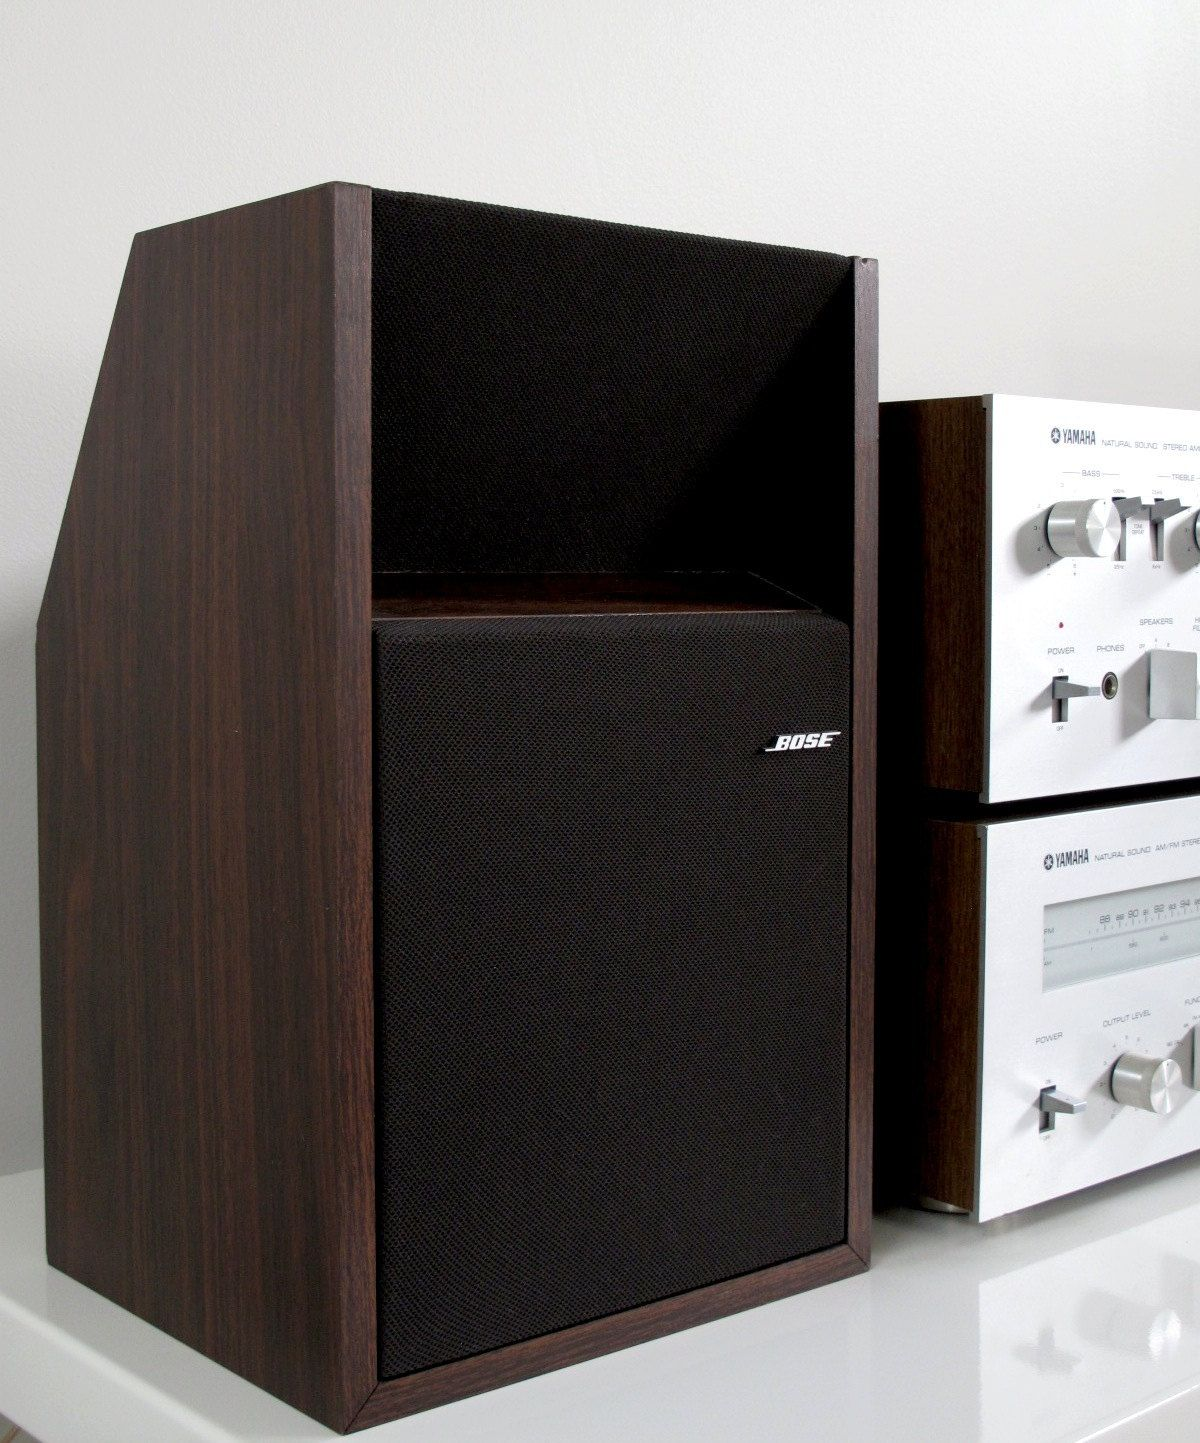 bose 201 series iii. bose 201 series ii direct/reflecting bookshelf stereo speakers, faux rosewood finish. $75.00 iii r